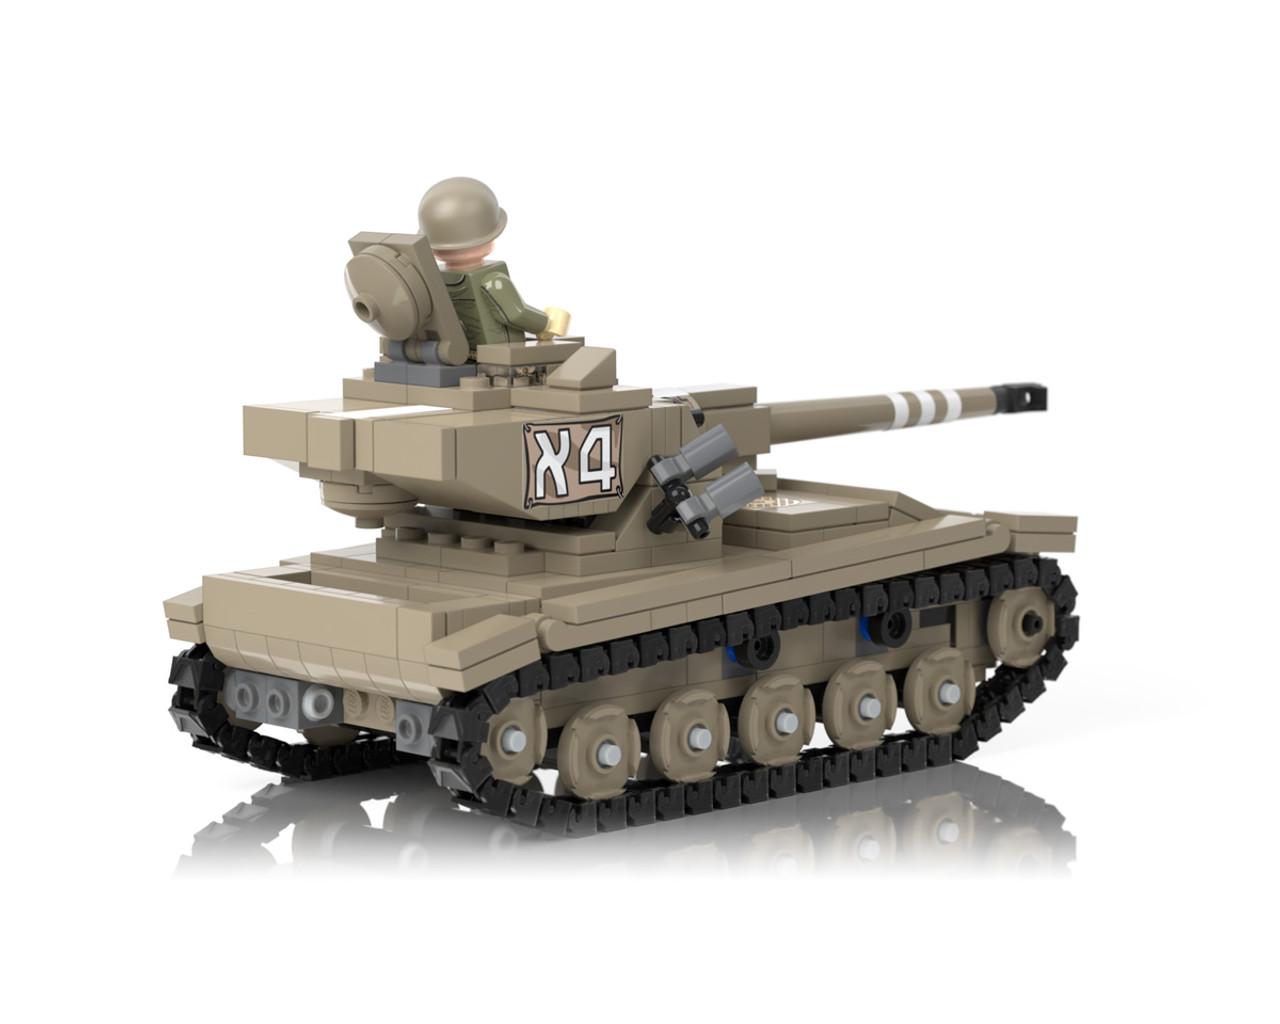 AMX-13 Light Tank - Israeli Army - Six-Day War